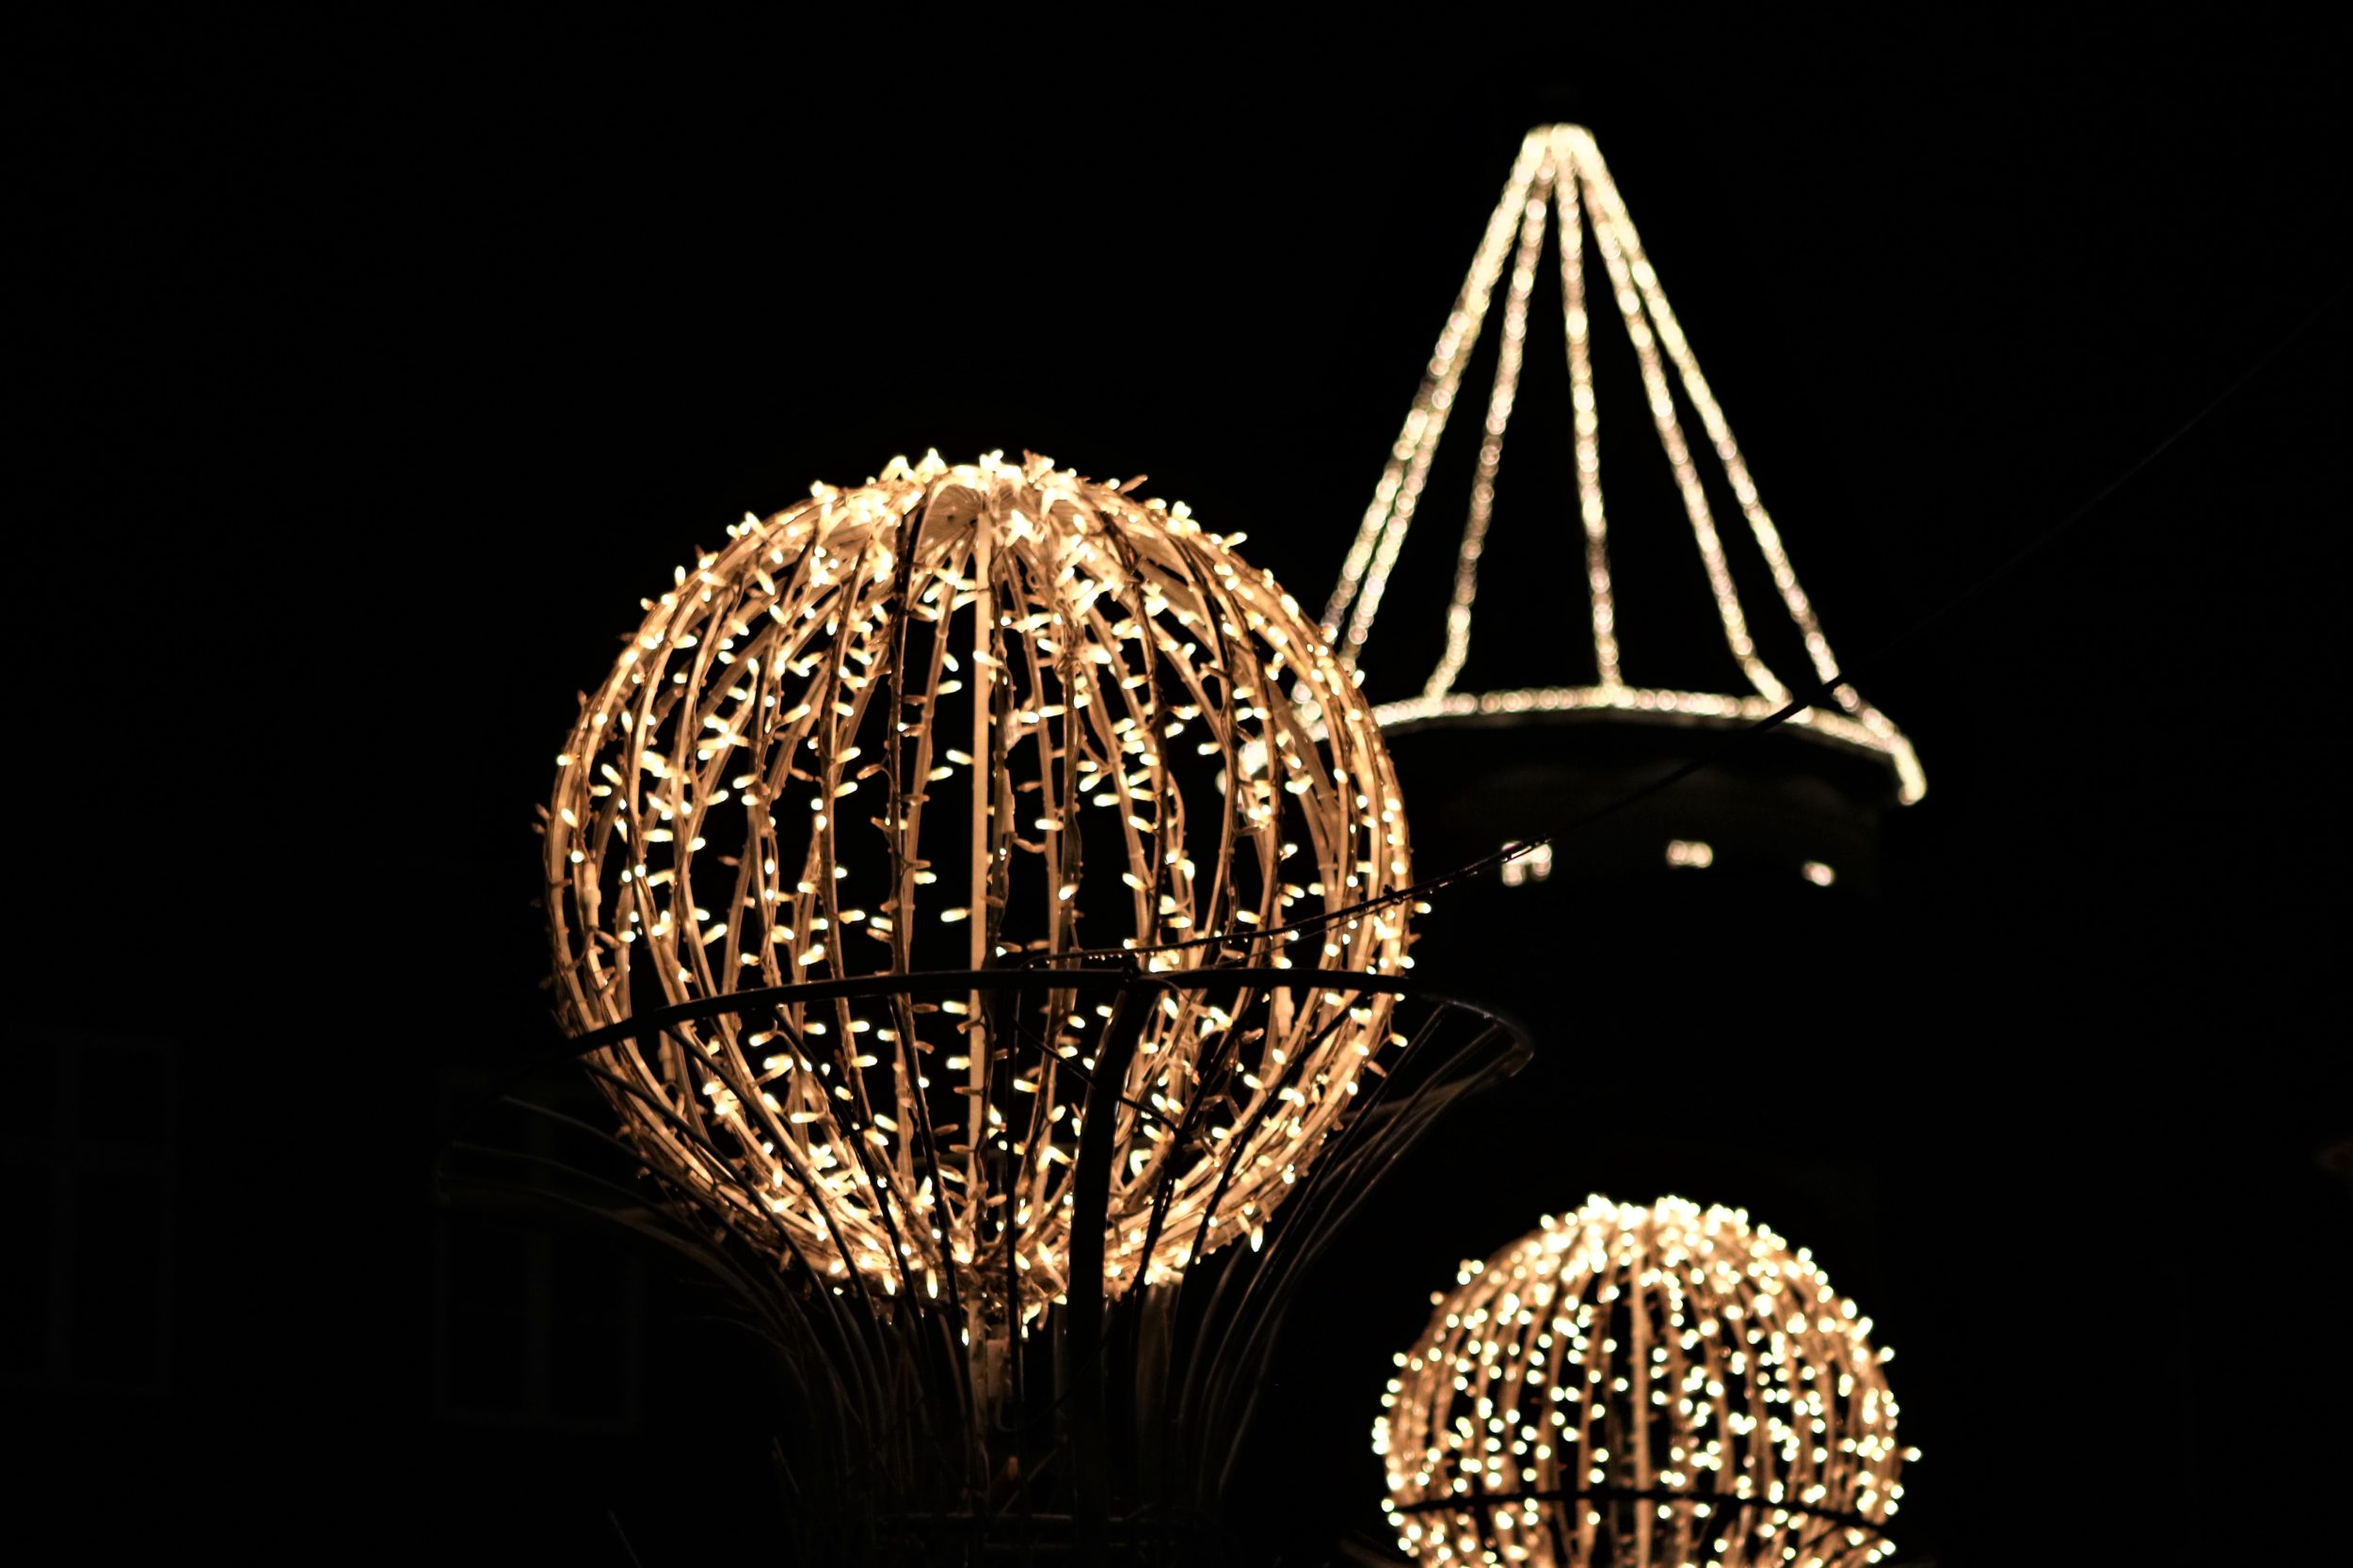 Kæmpe Lysfestival kommer til Ringsted!